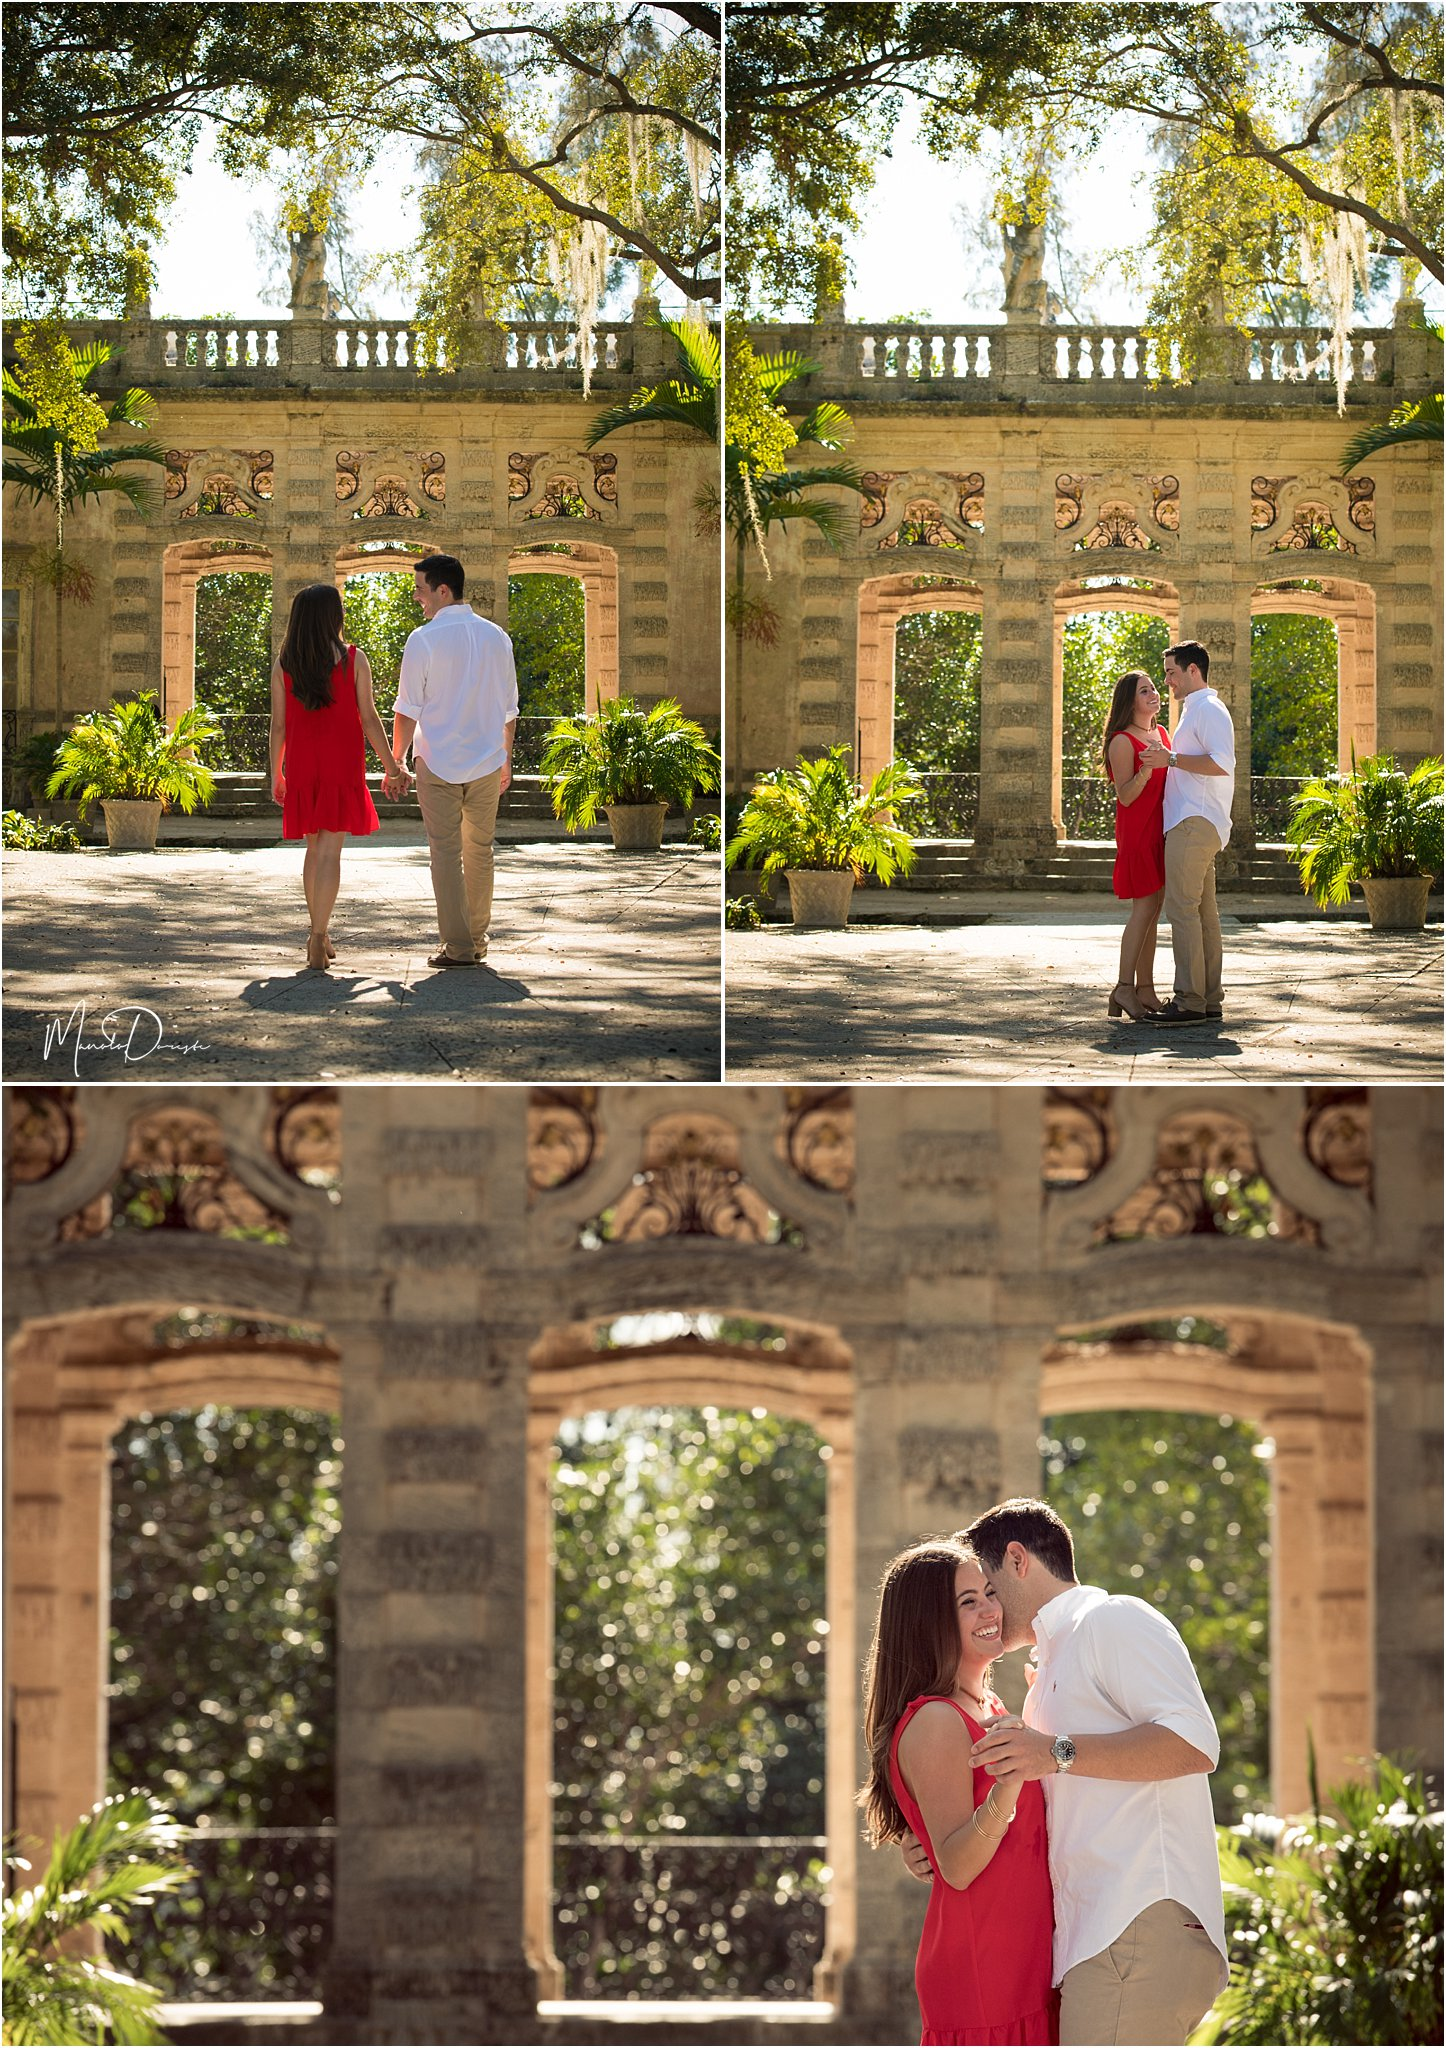 00861_ManoloDoreste_InFocusStudios_Wedding_Family_Photography_Miami_MiamiPhotographer.jpg